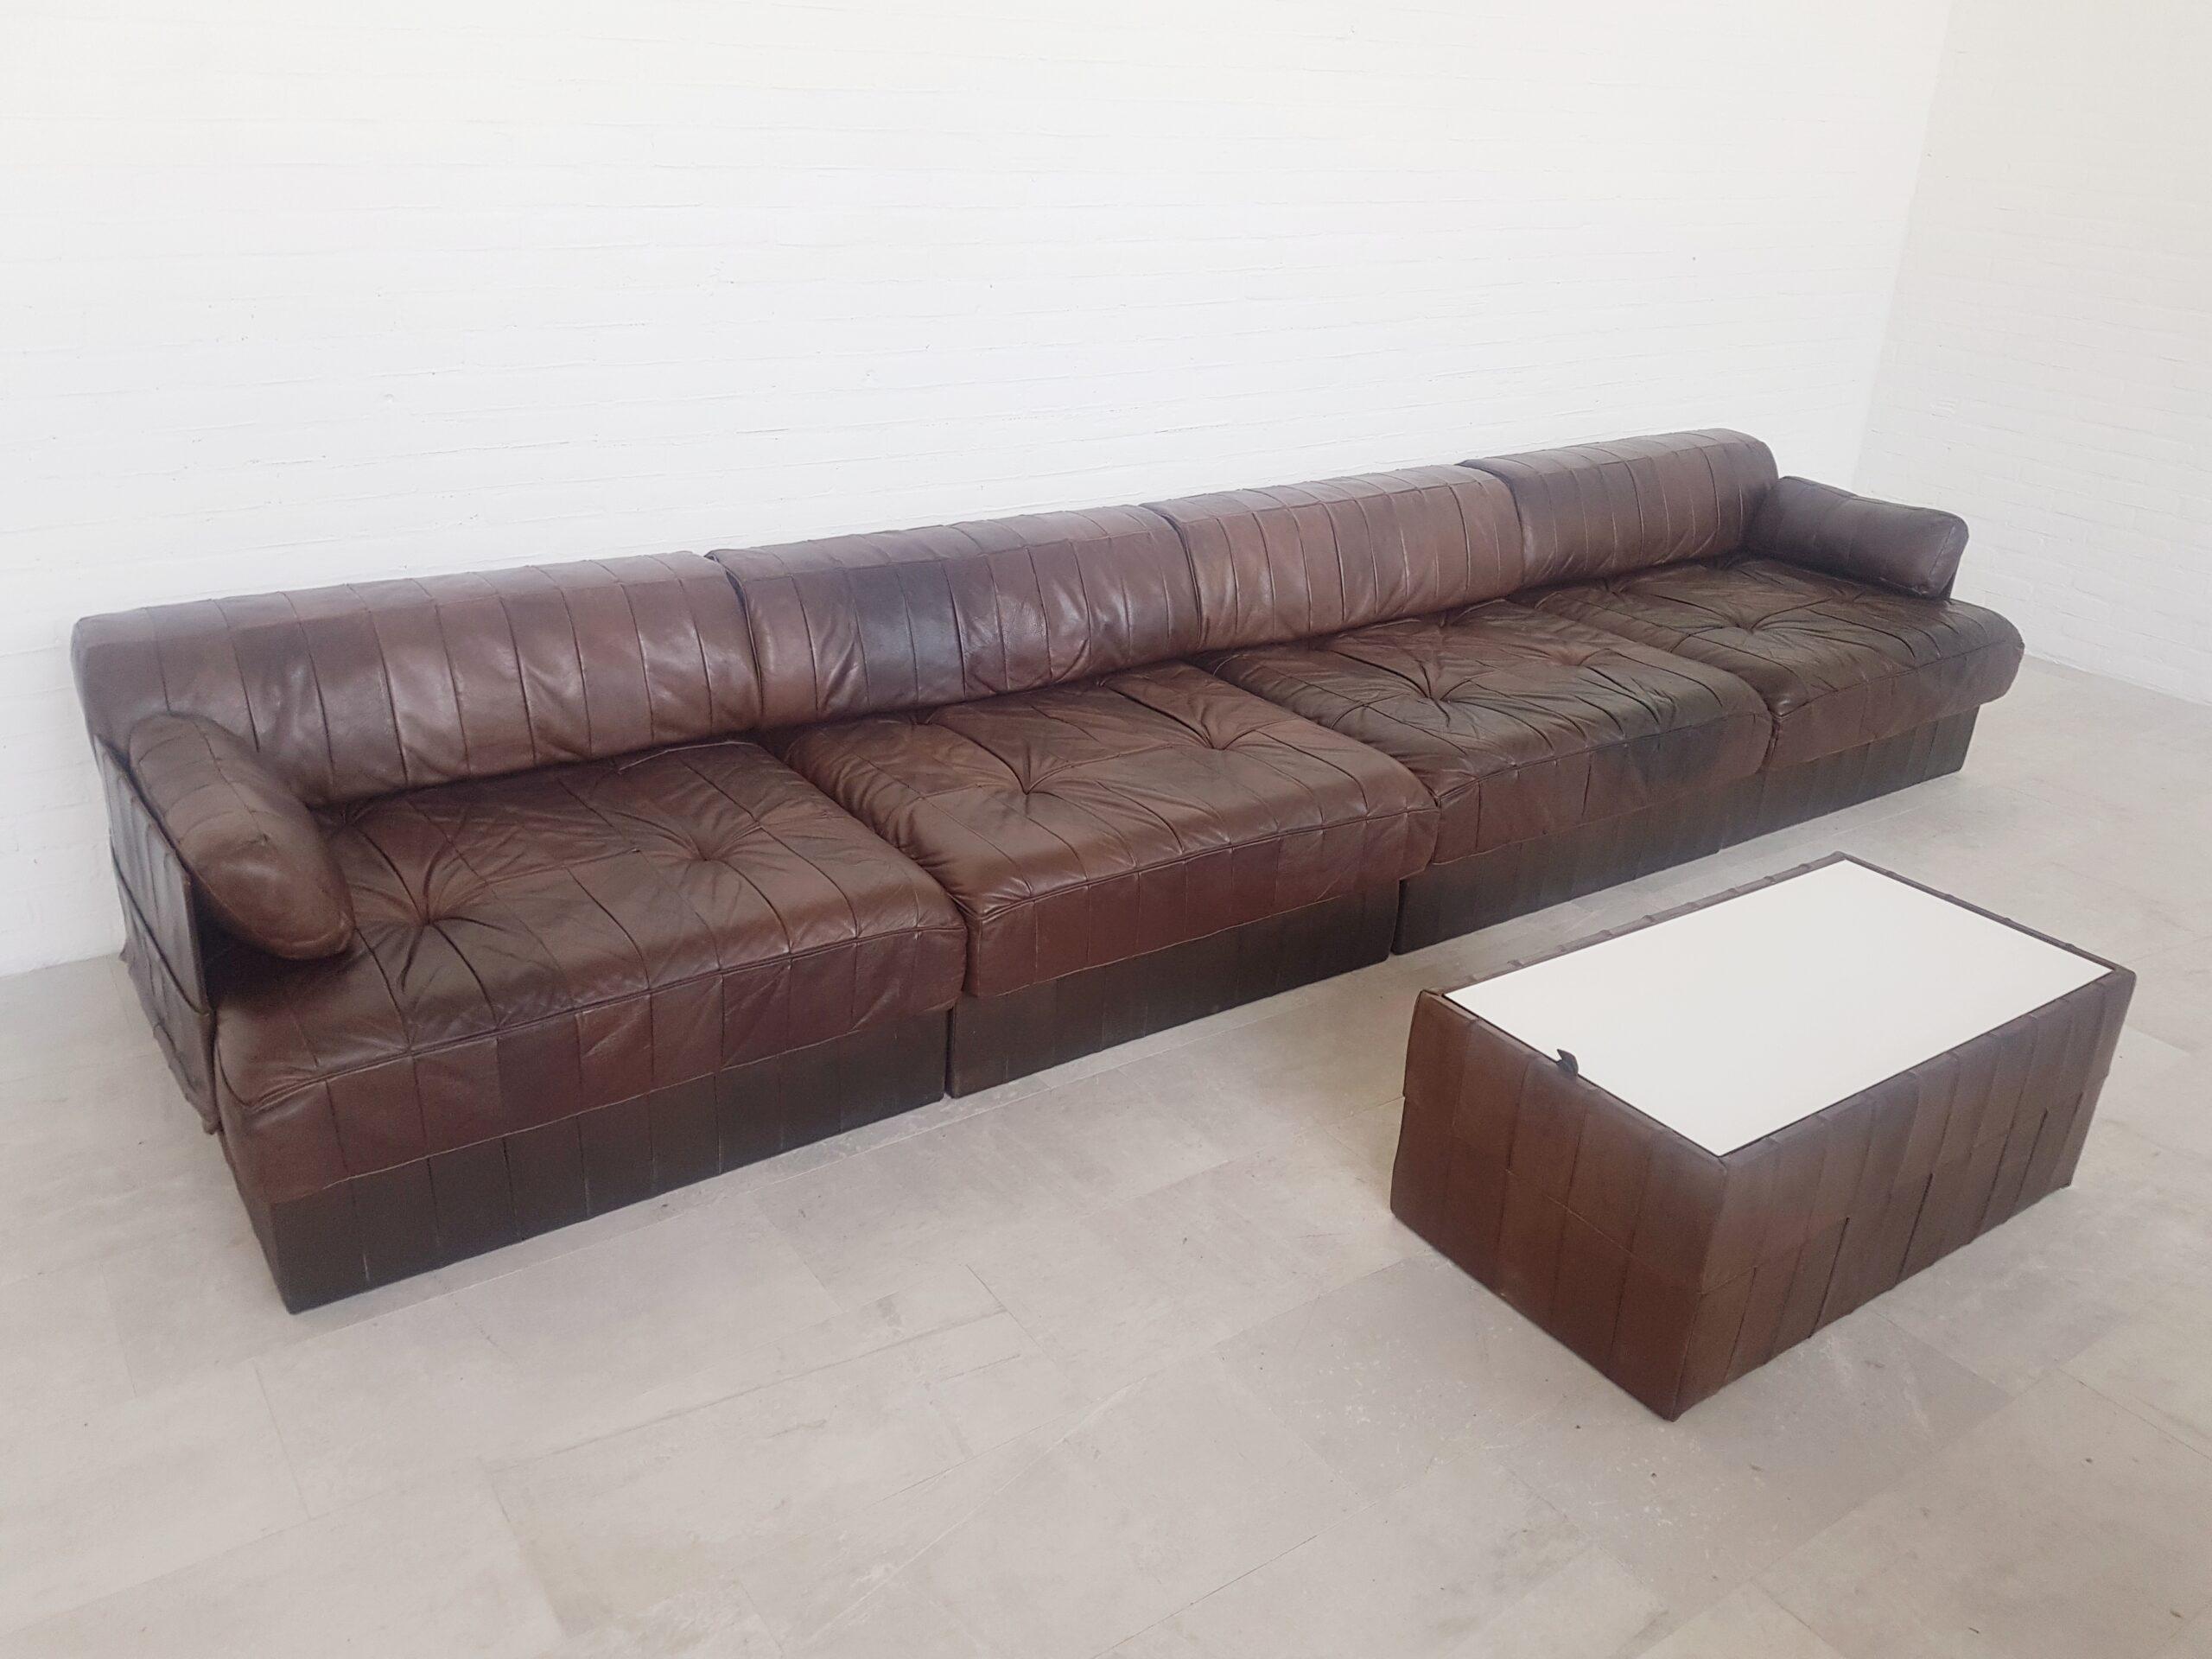 Full Size of De Sede Sofa Sessel Gebraucht Schweiz Couch Furniture For Sale Ds 47 Usa Preisliste Endless 600 Bi By Kaufen Outlet Uk Leder Ds88 Modular Patchwork Eck 3 Sofa De Sede Sofa